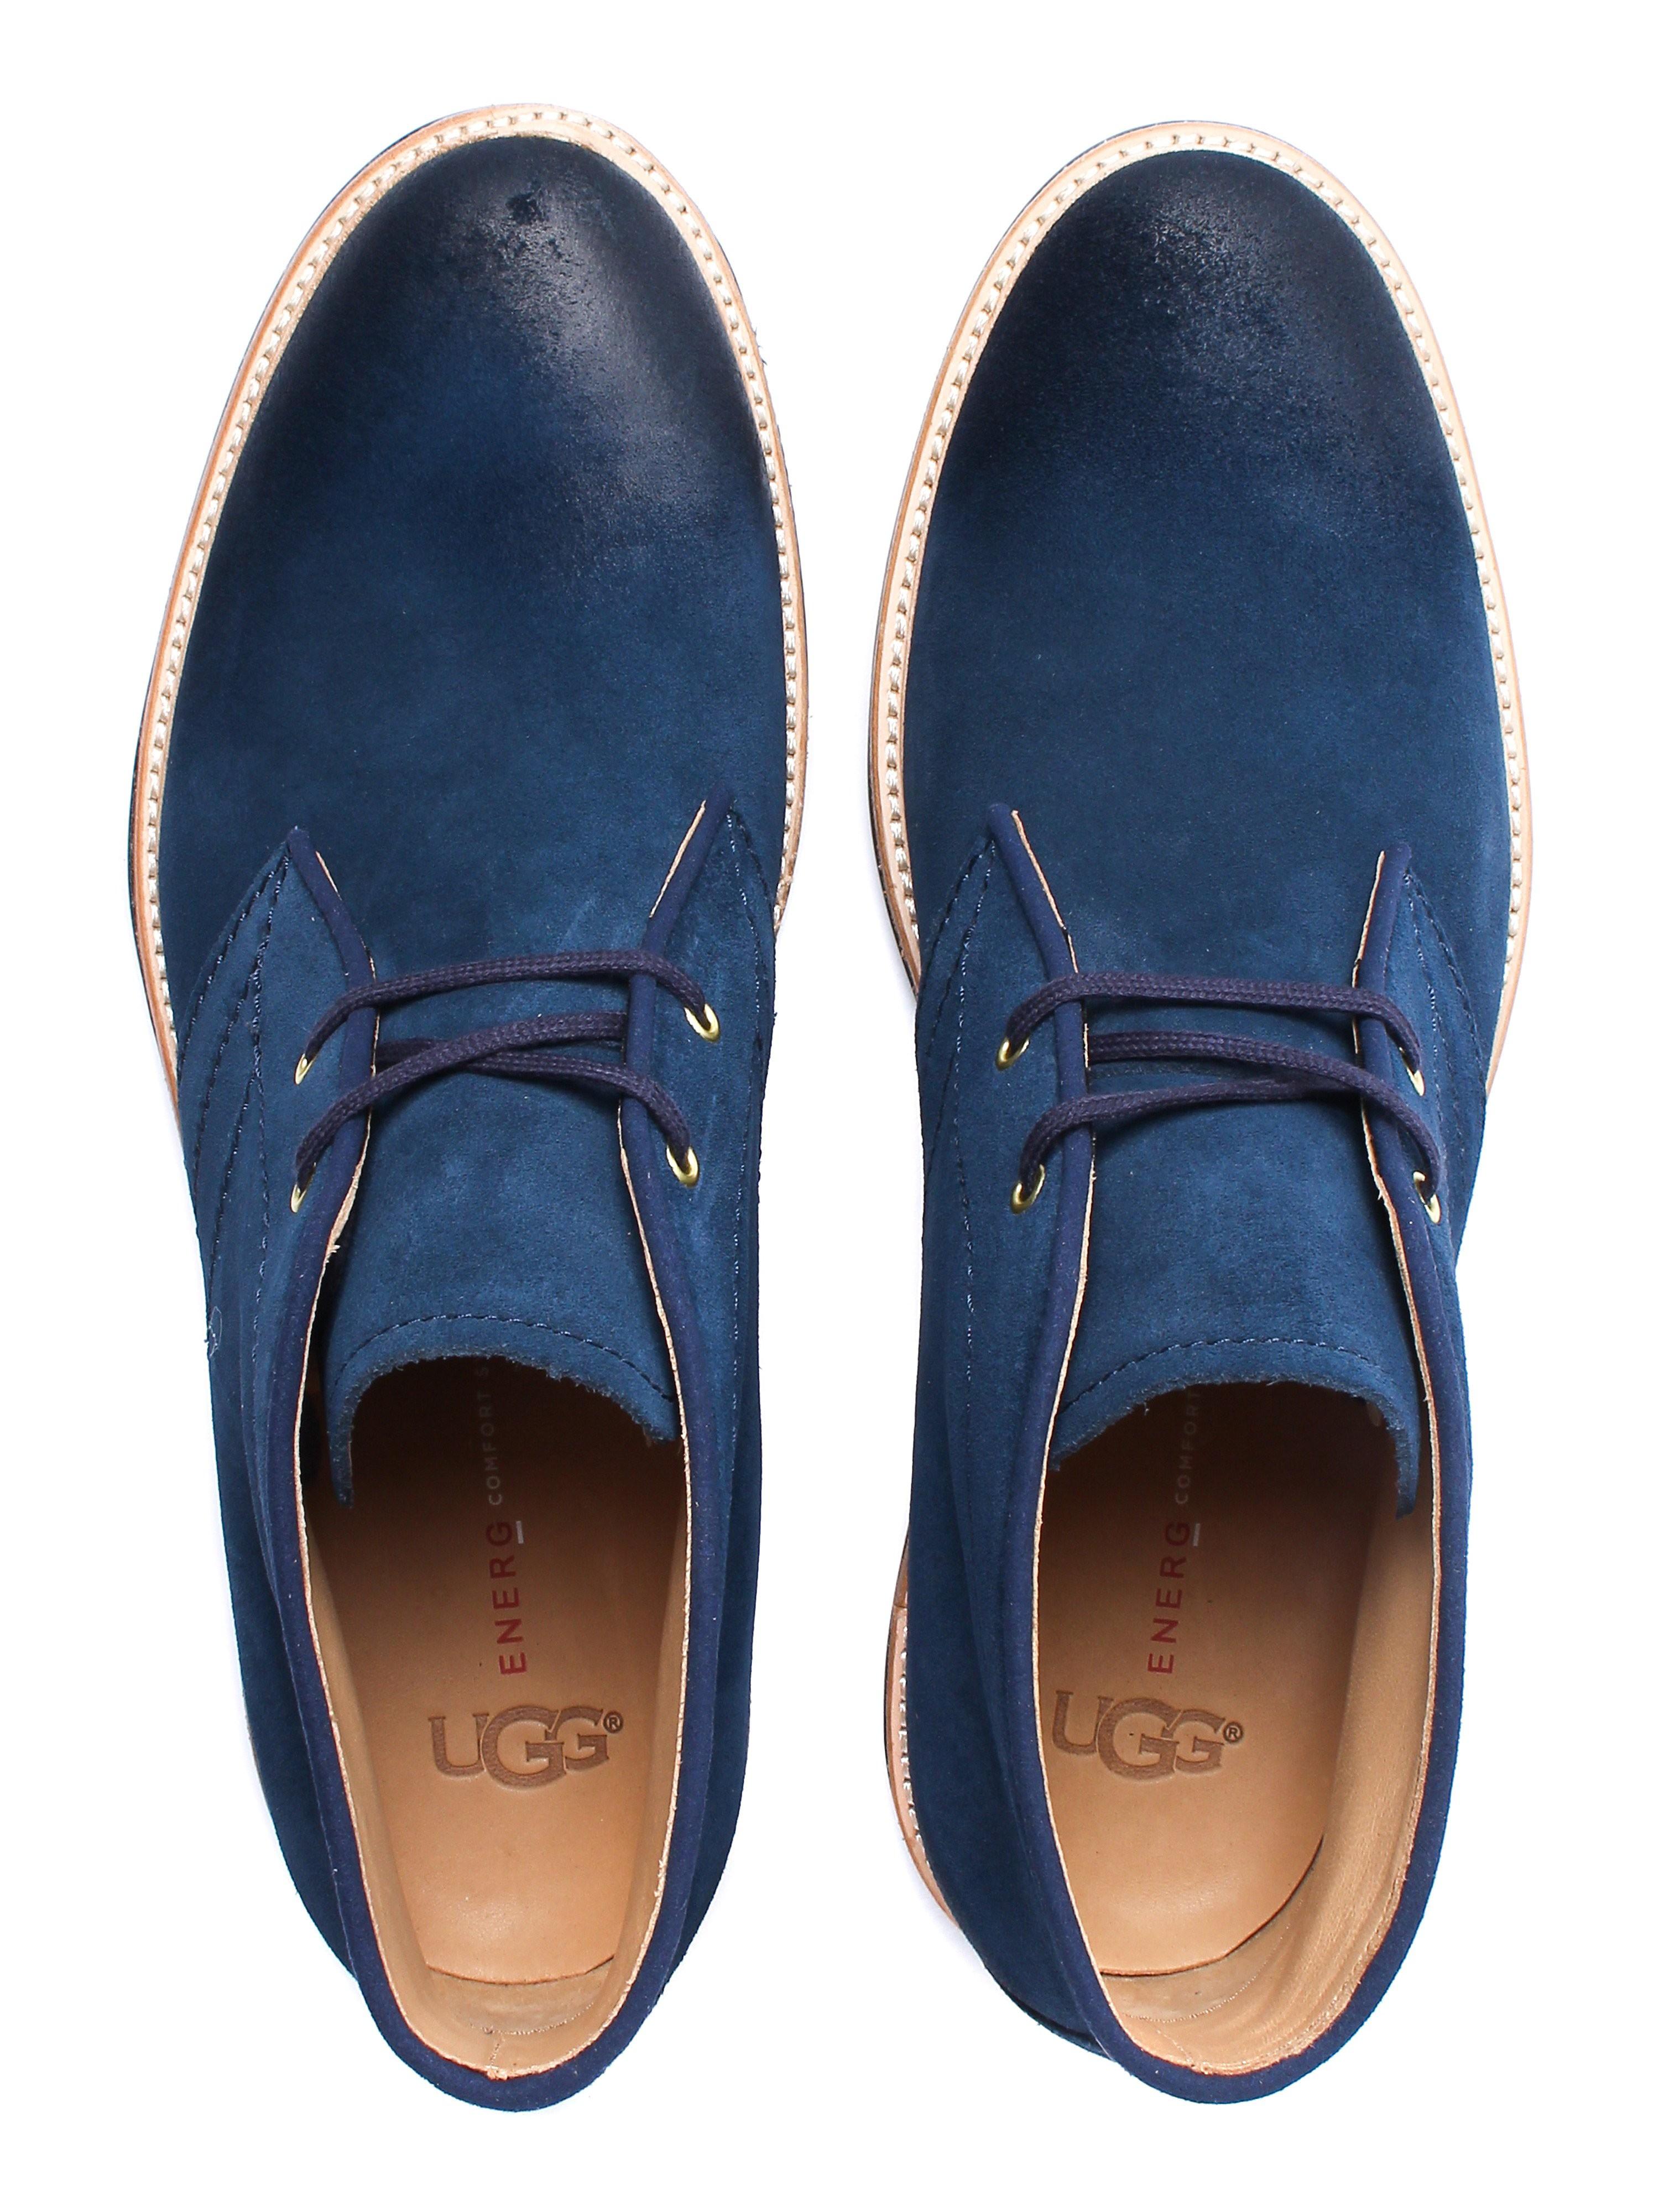 UGG Men's Dagmann Boots - Navy Suede